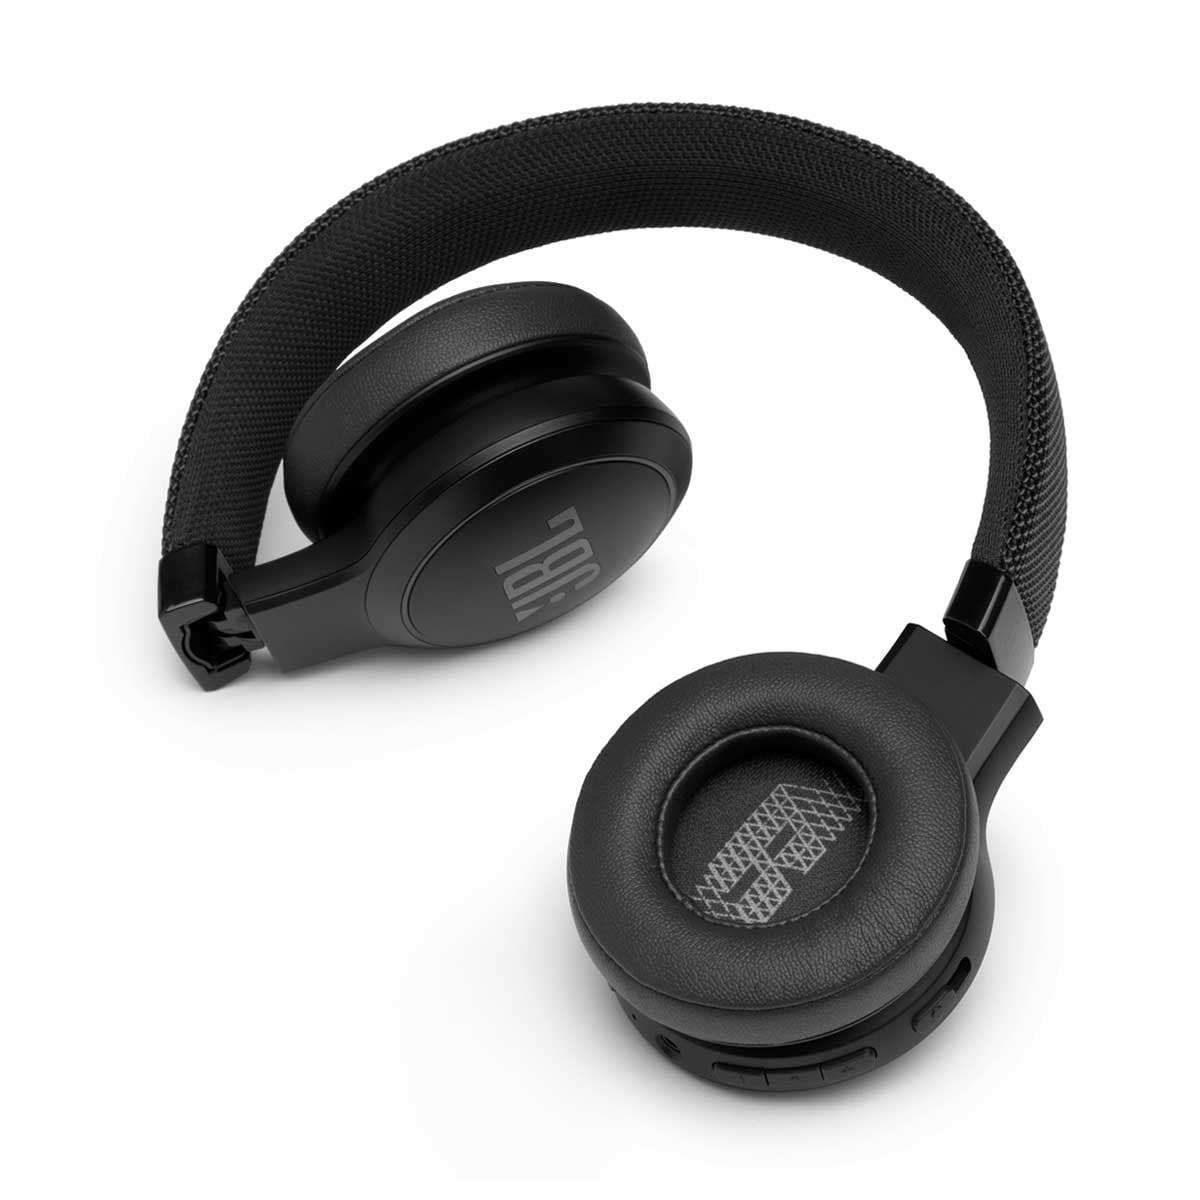 Audífonos Over Ear Inalámbricos Live 400 Negro Jbl